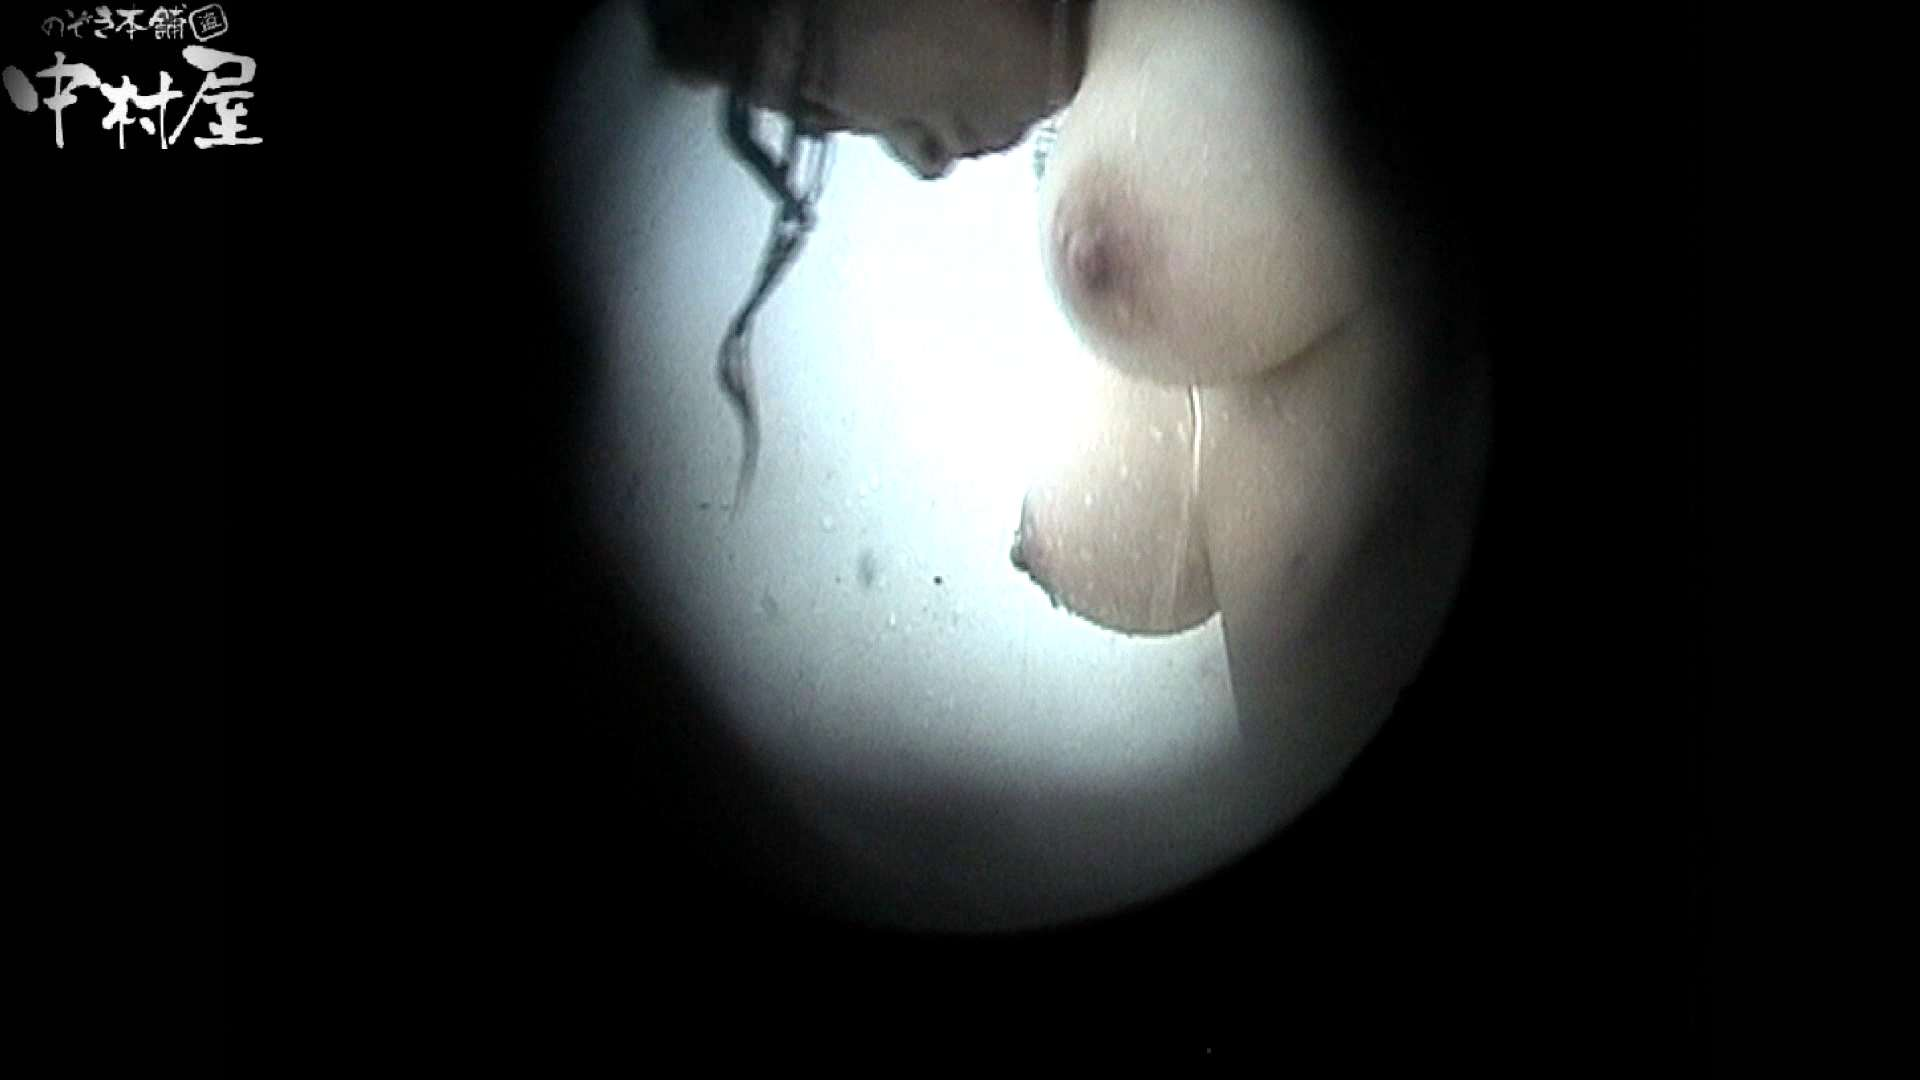 No.46 マシュマロ巨乳が目の前でプルプル 巨乳 おめこ無修正画像 78連発 59